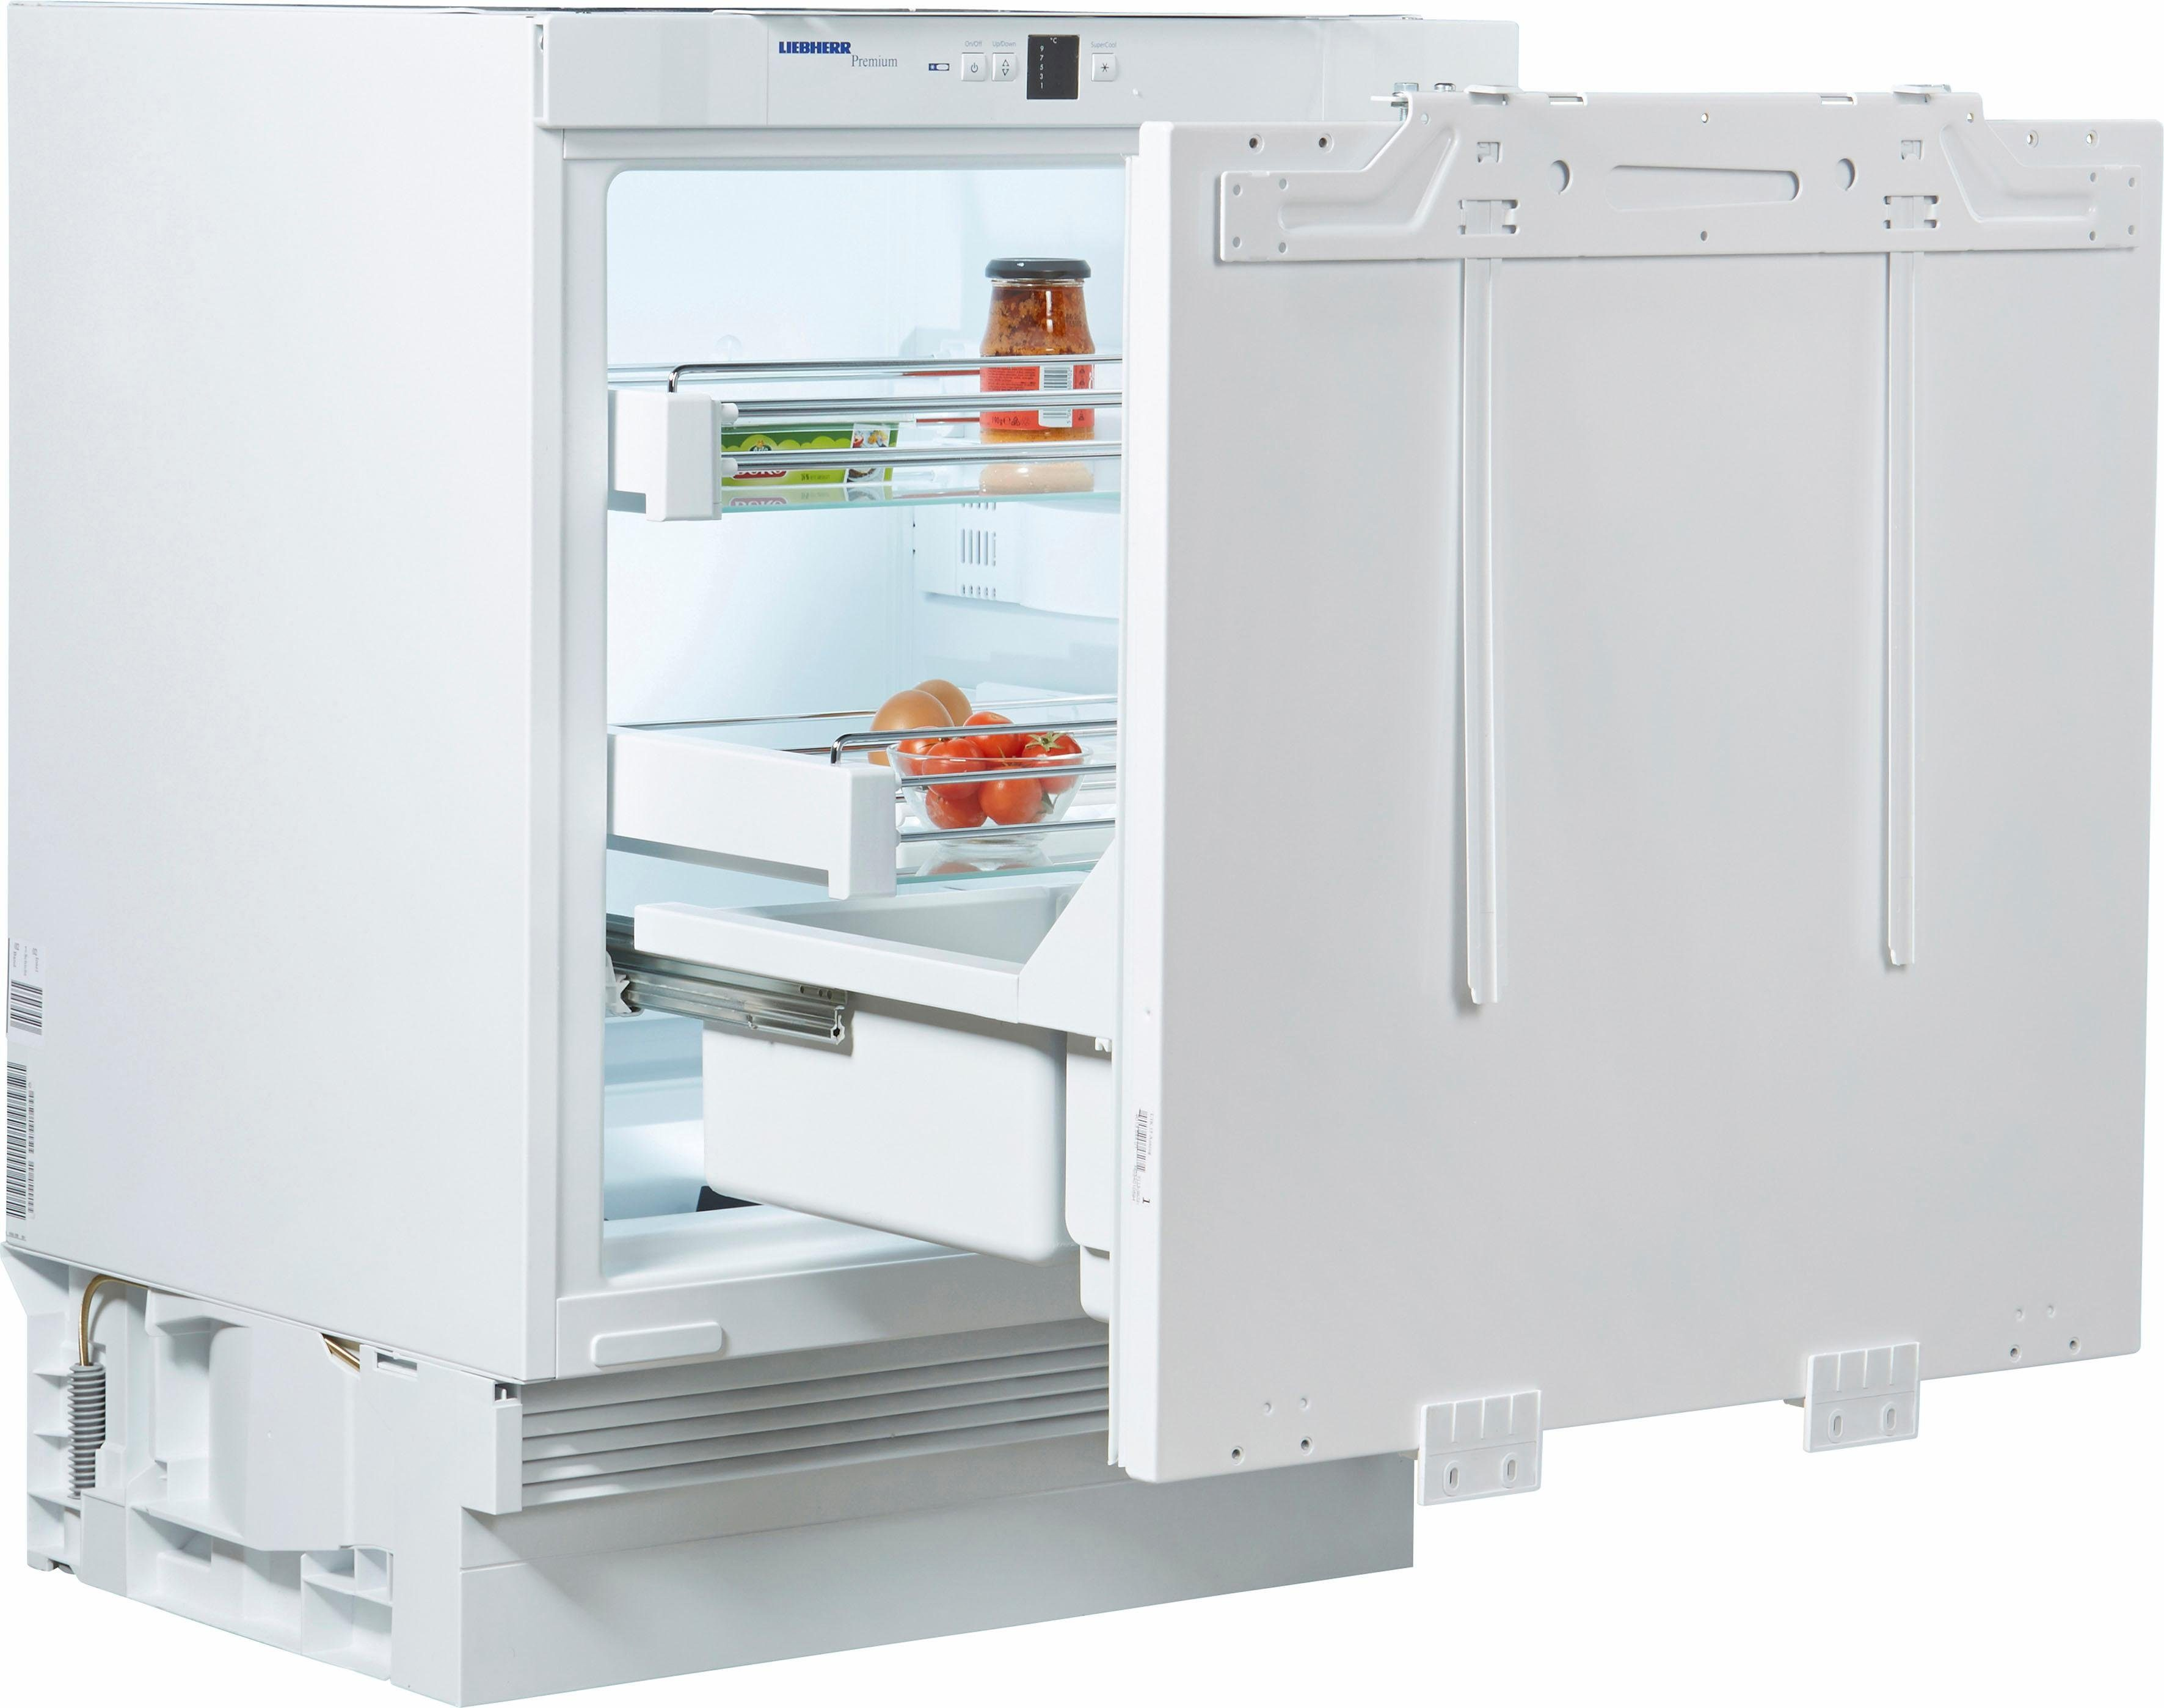 Aeg Unterbau Kühlschrank Dekorfähig : Liebherr integrierbarer unterbau kühlschrank uik